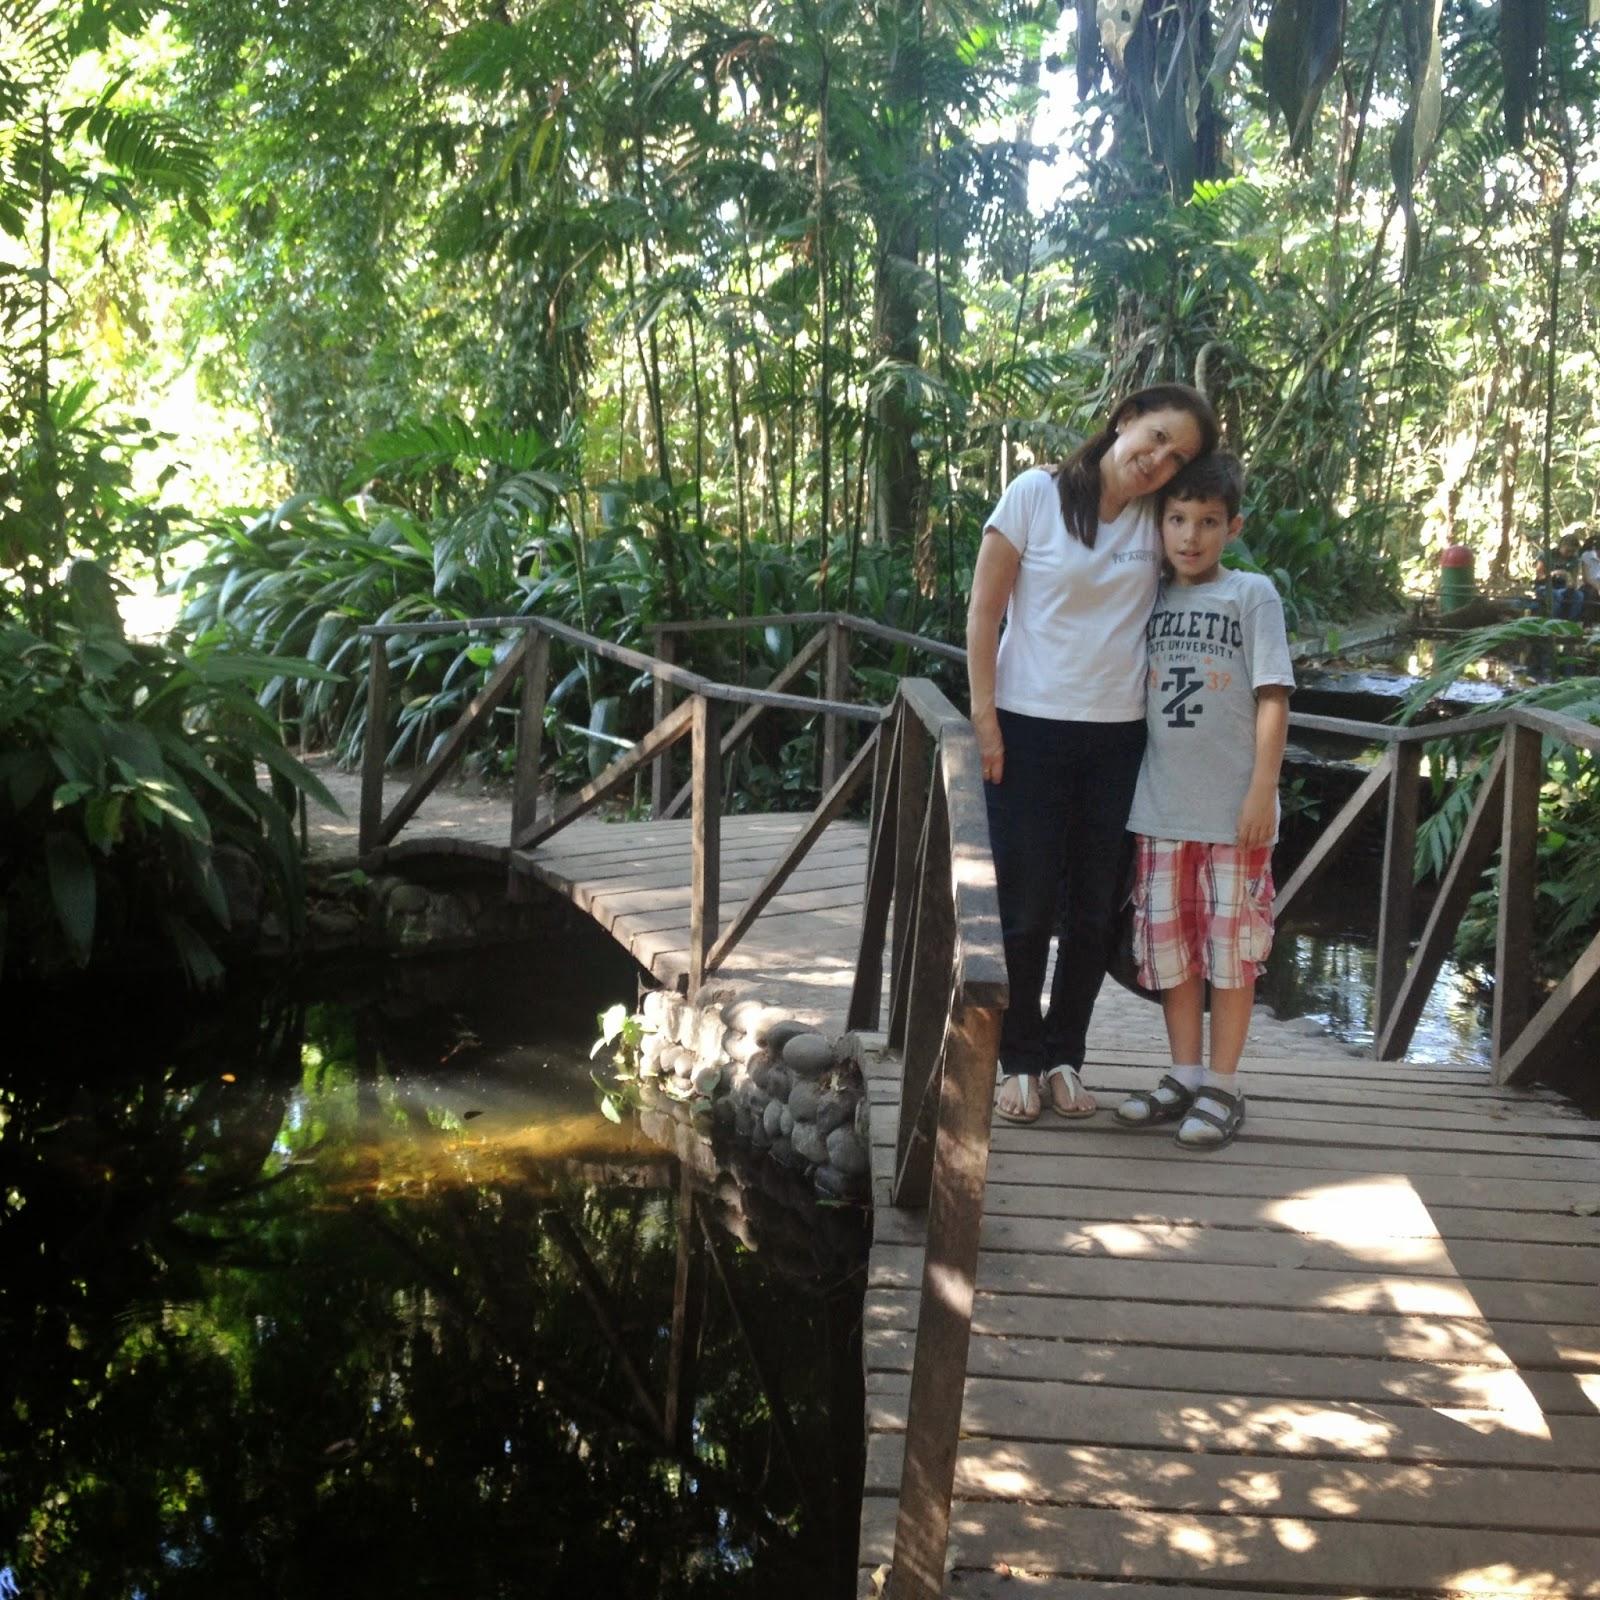 Imagenes jard n bot nico la laguna antiguo cuscatl n for Vivero el botanico